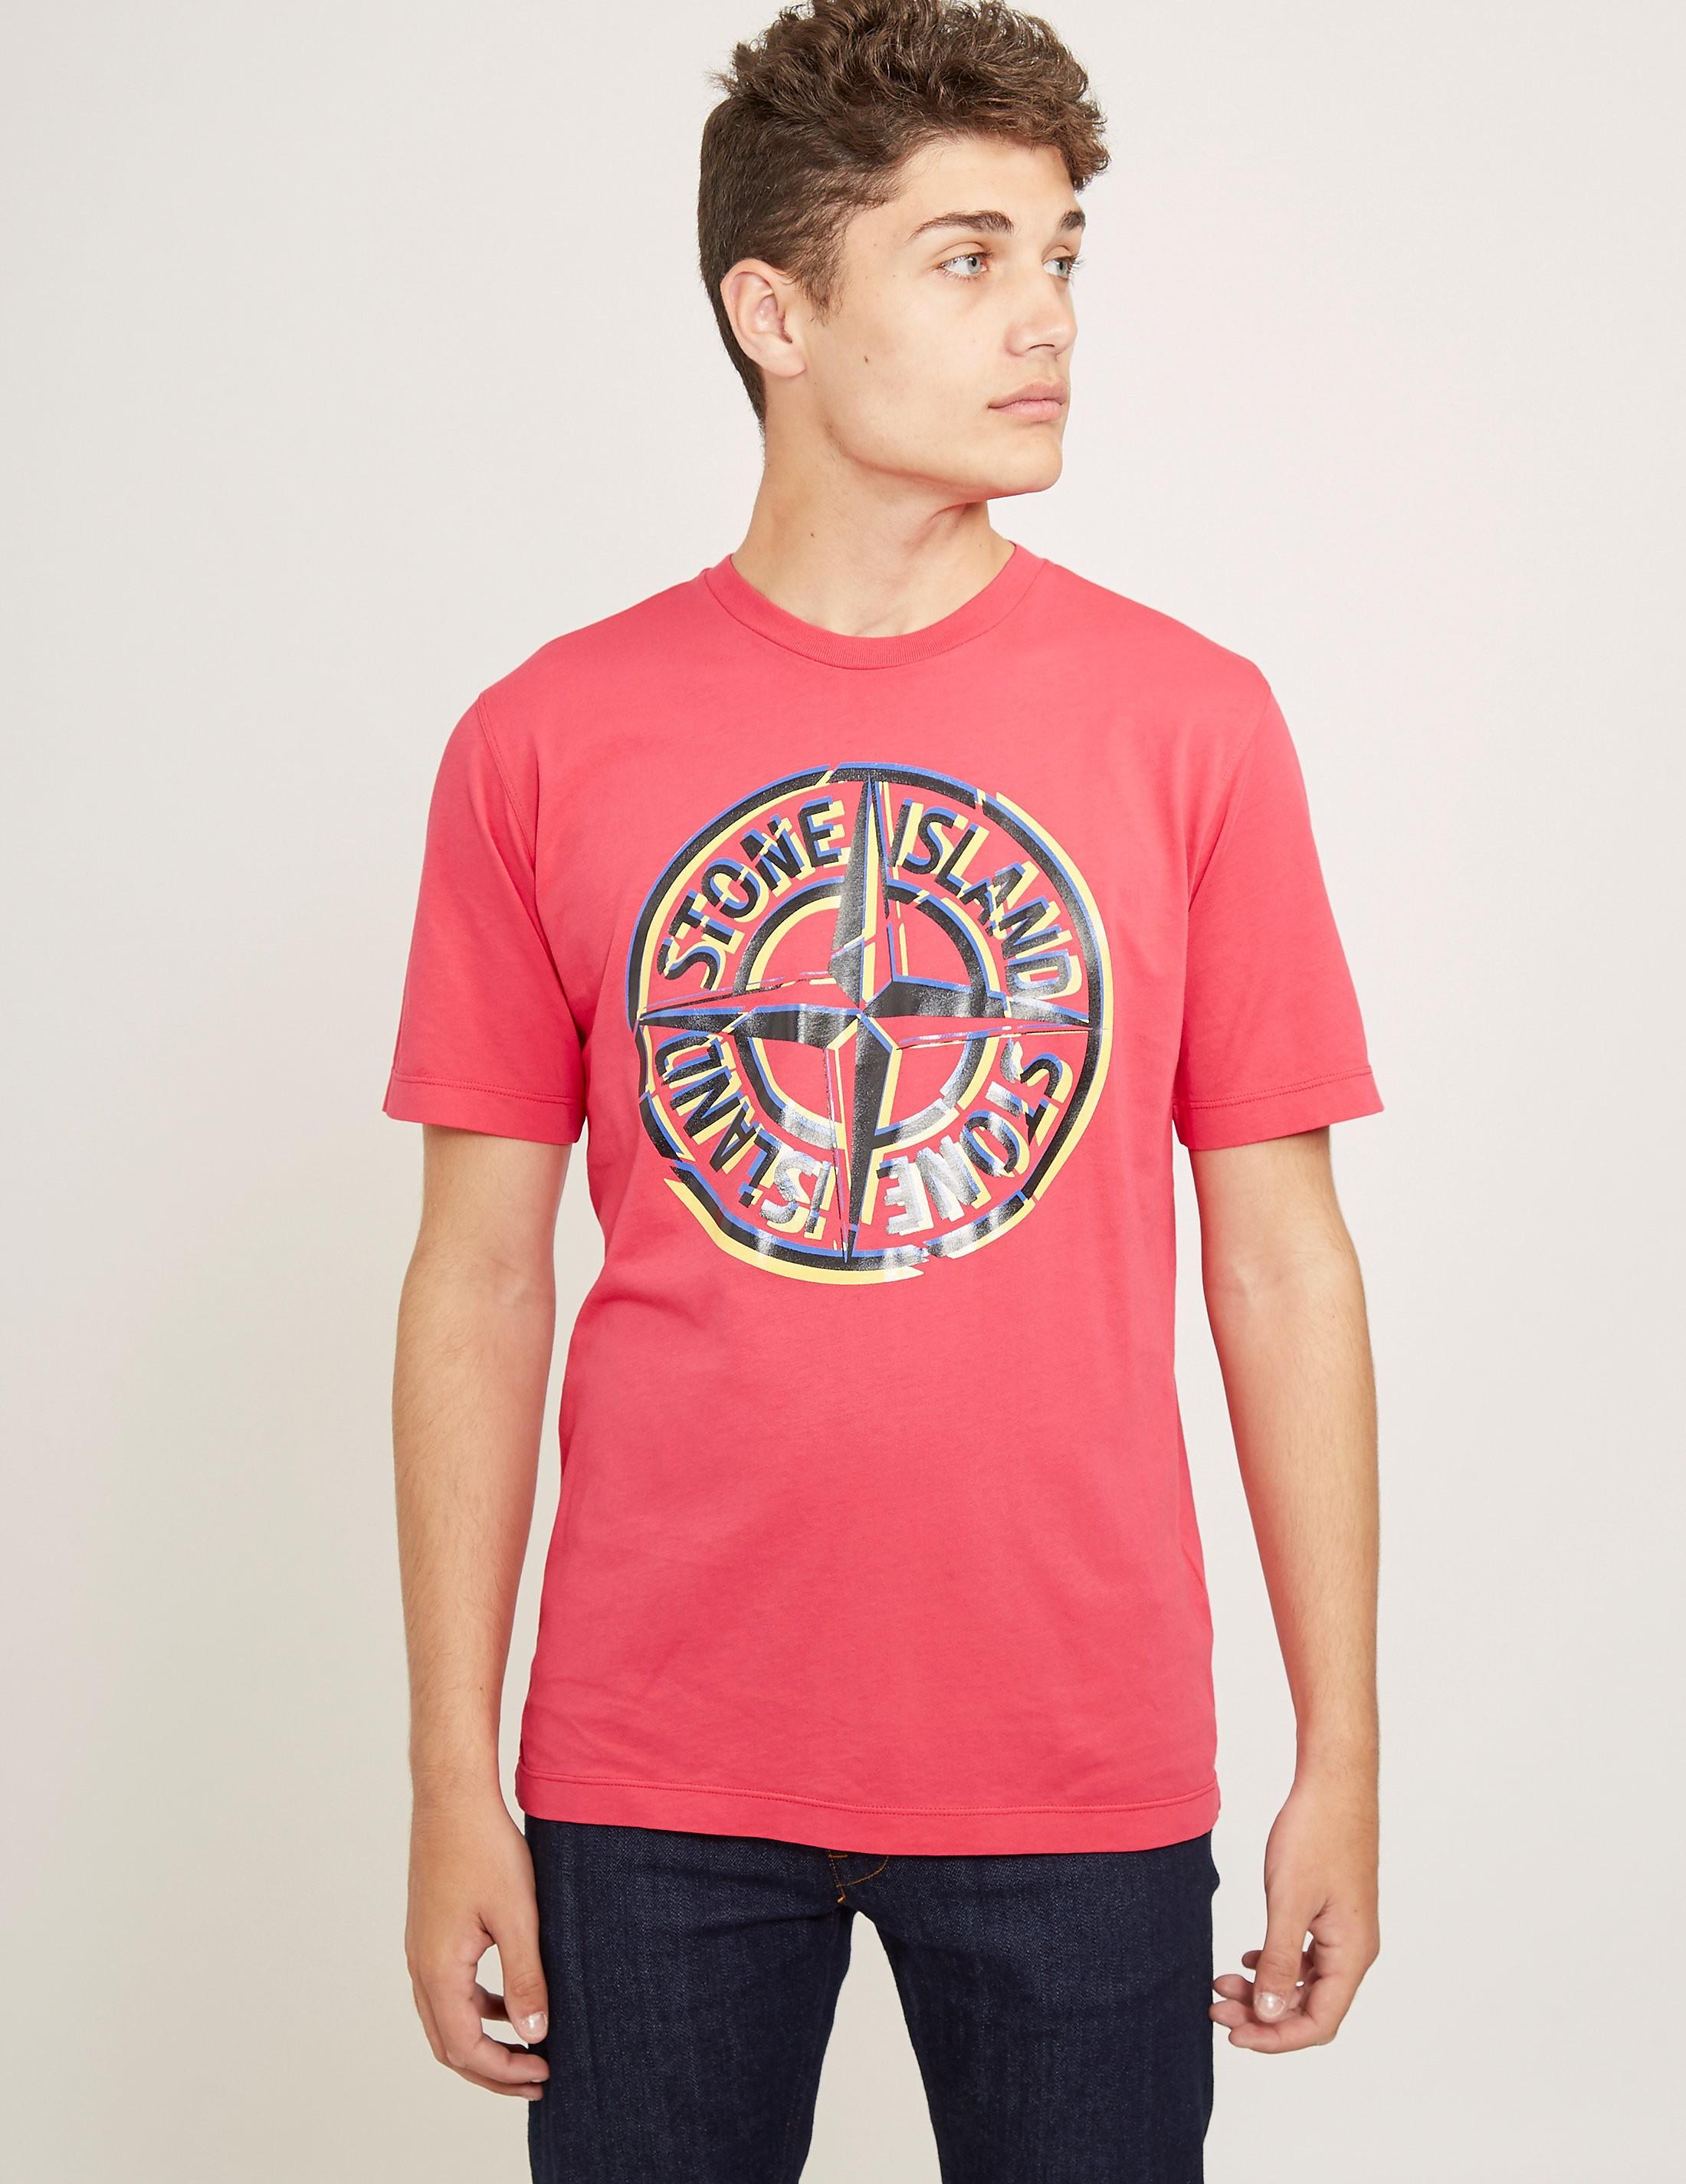 Stone Island Pin Short Sleeve T-Shirt